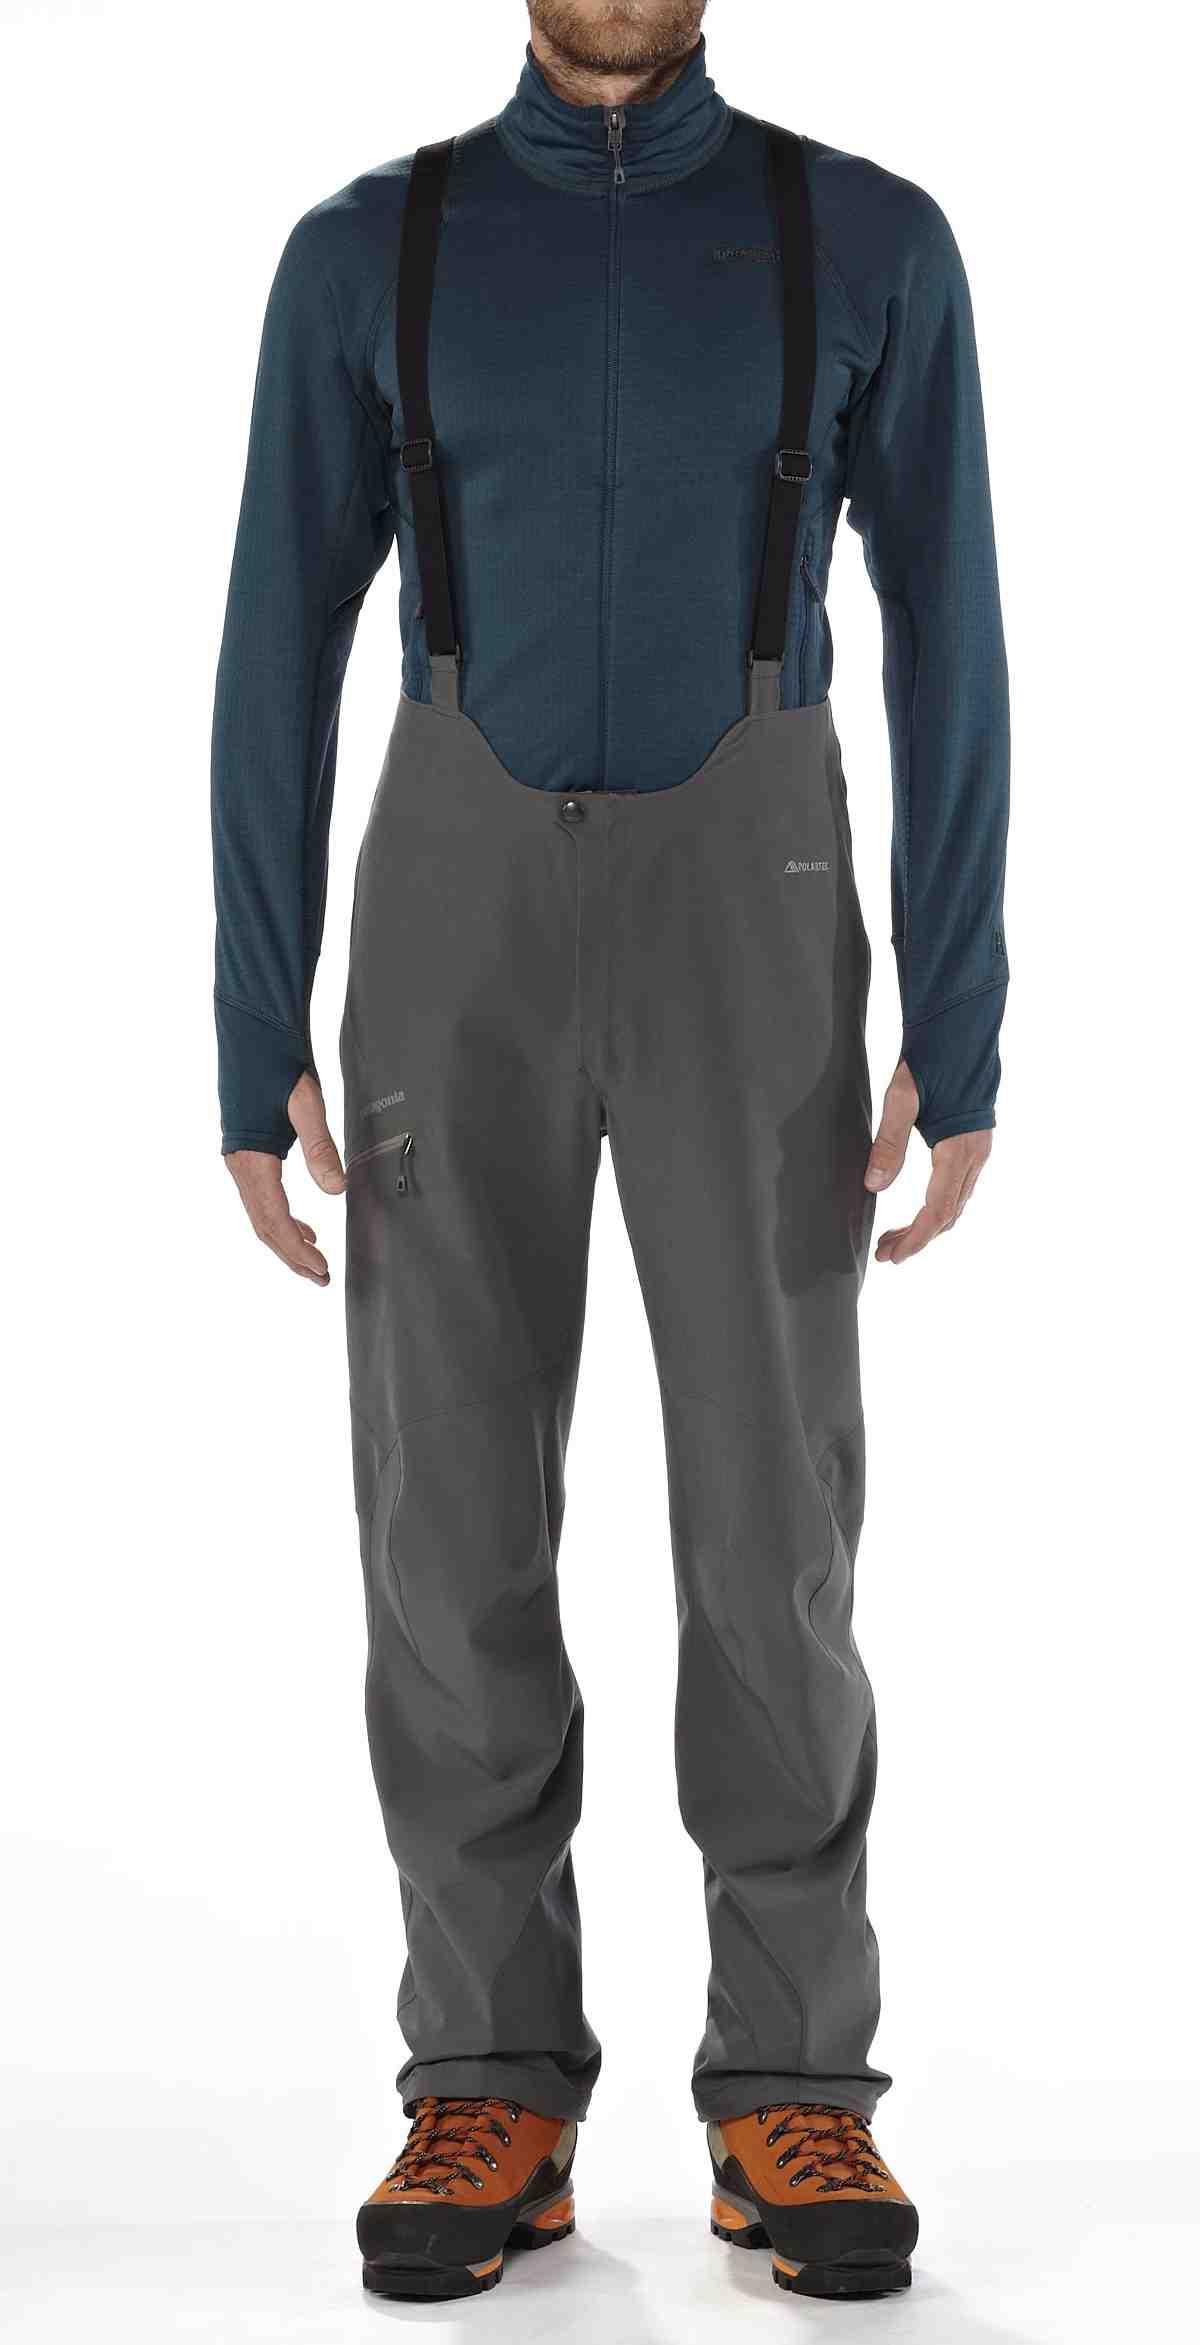 Patagonia Knifeblade Pants with Polartecr Power Shieldr Pro